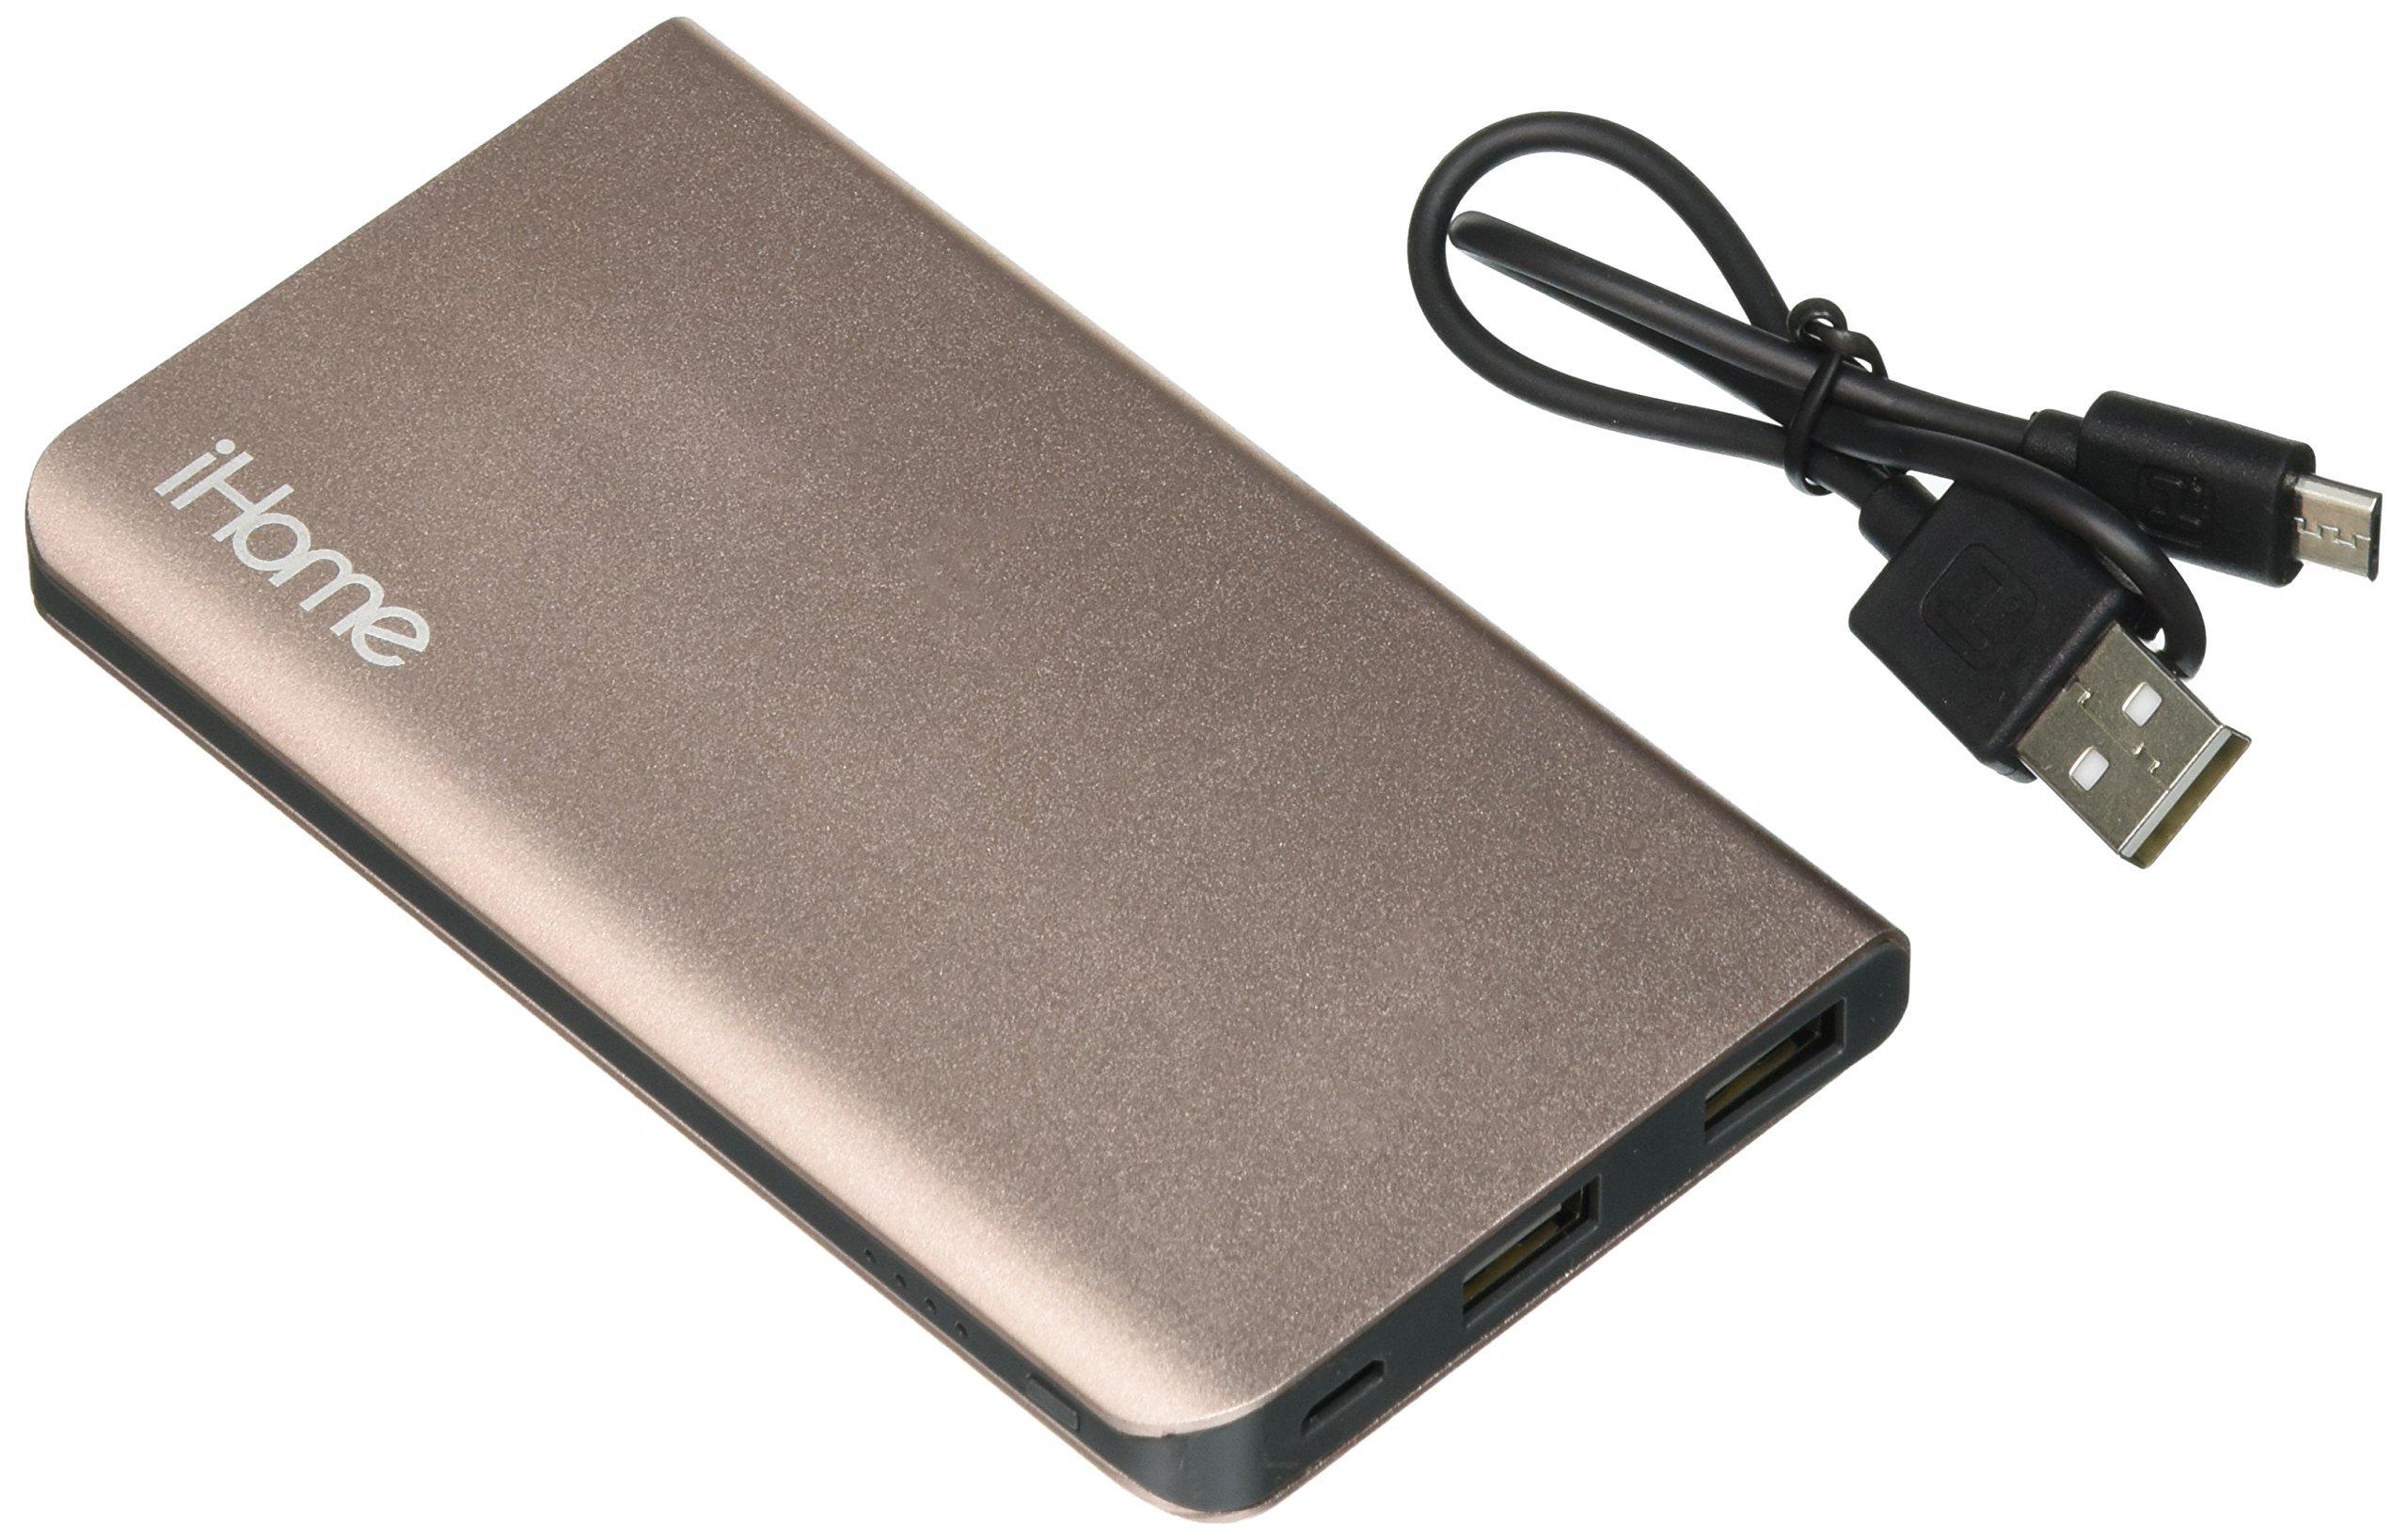 iHome External Battery Pack - ROSE GOLD